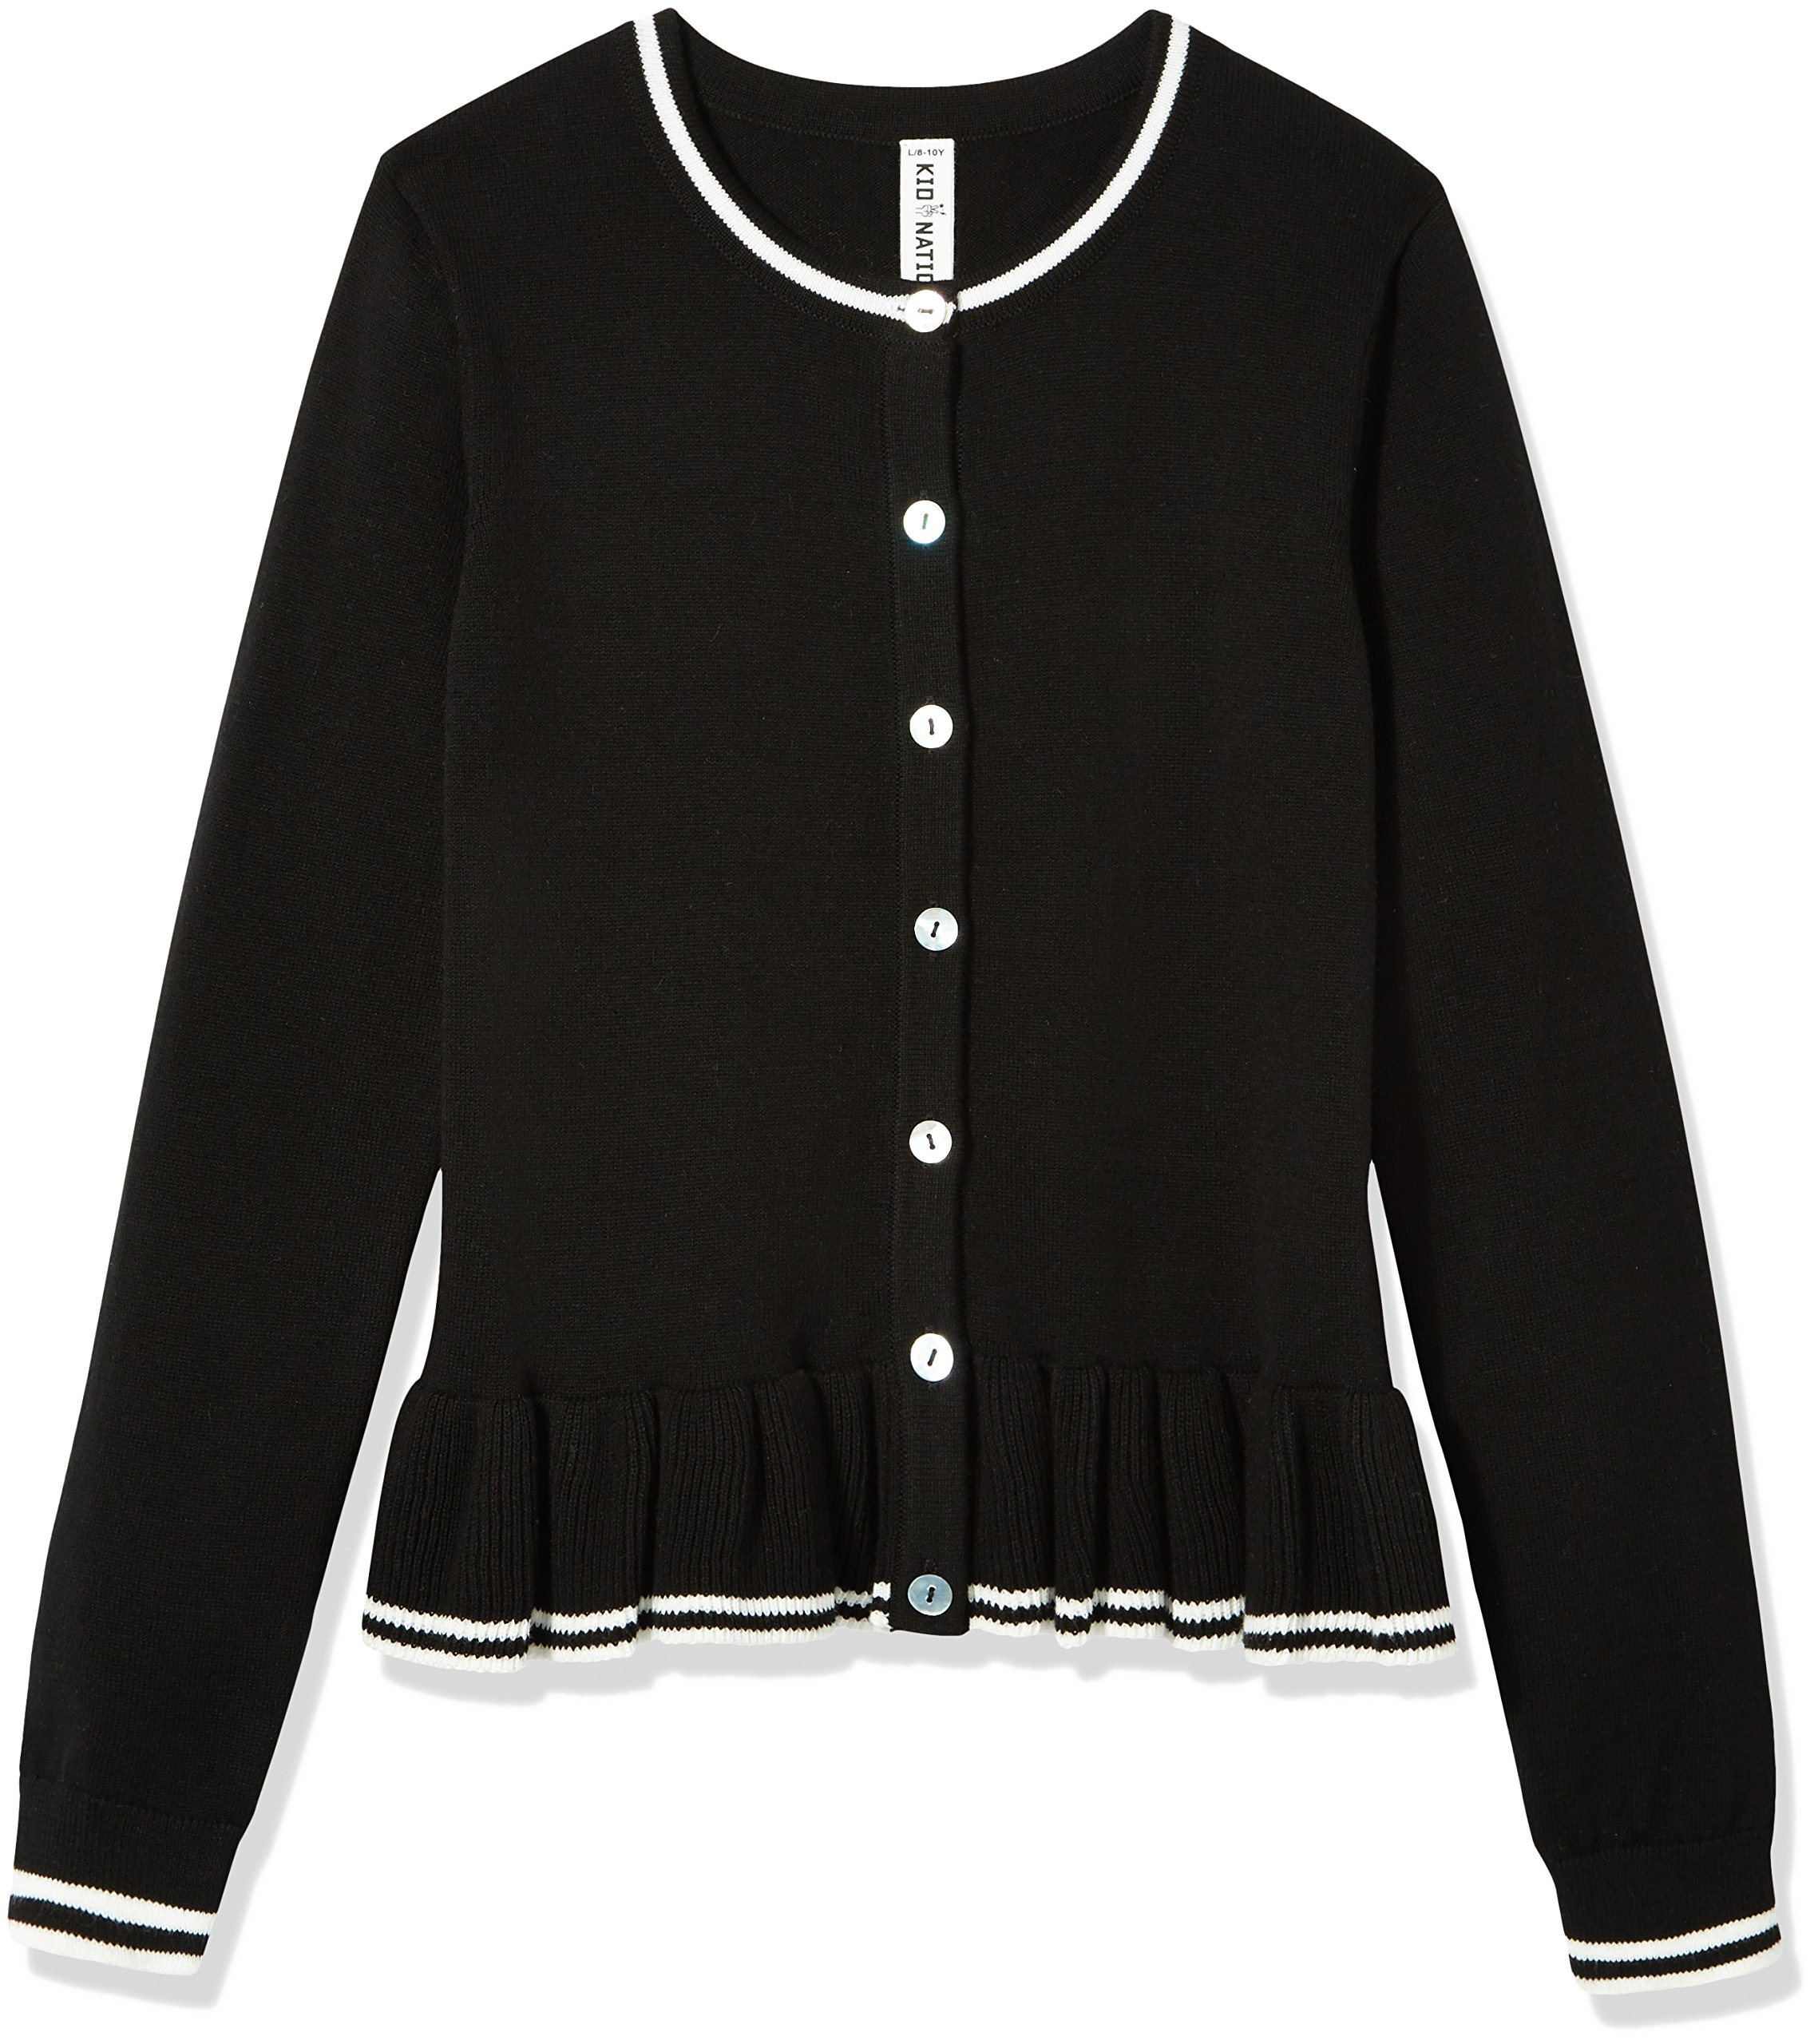 Kid Nation Girls' Long Sleeve Ruffles Cardigan Sweater Size M Black